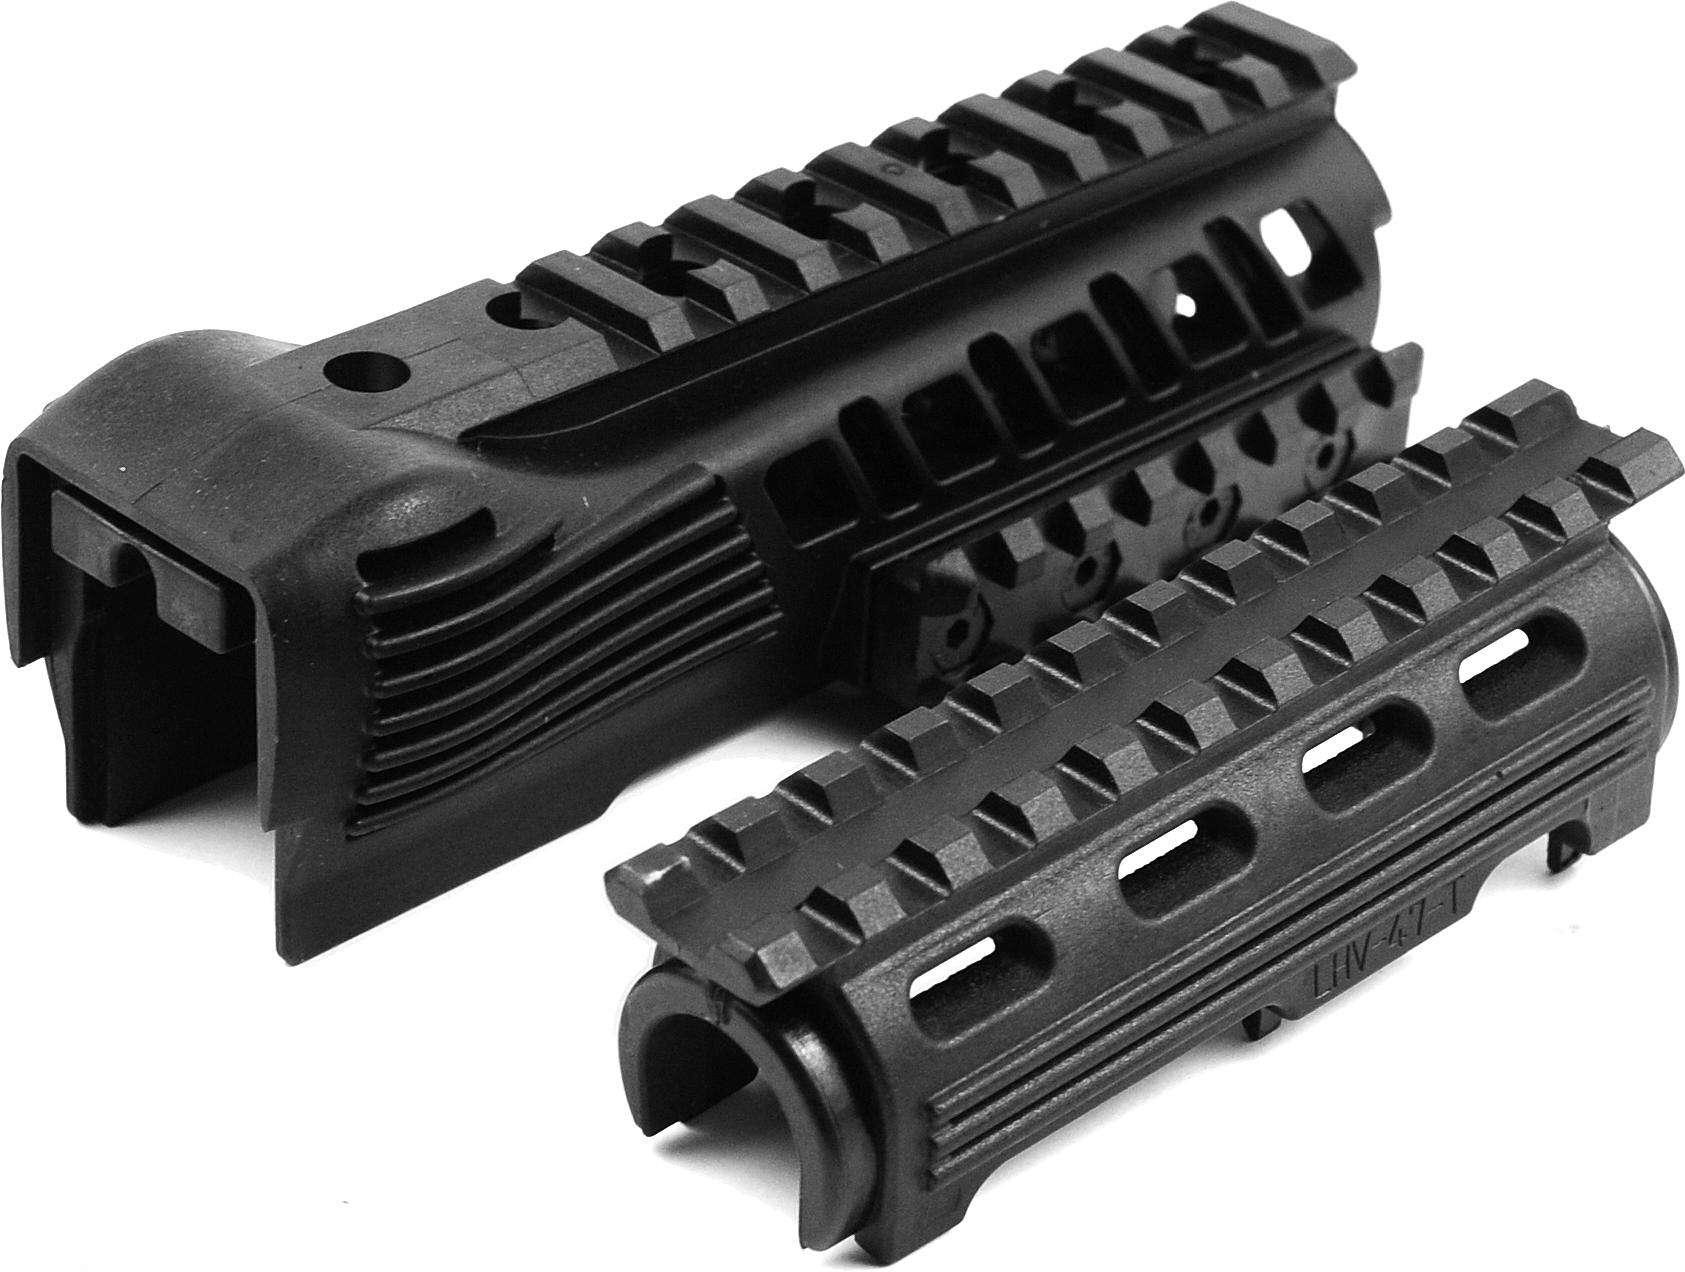 CAA AK47 Picatinny Handguard Rails System - Complete Set